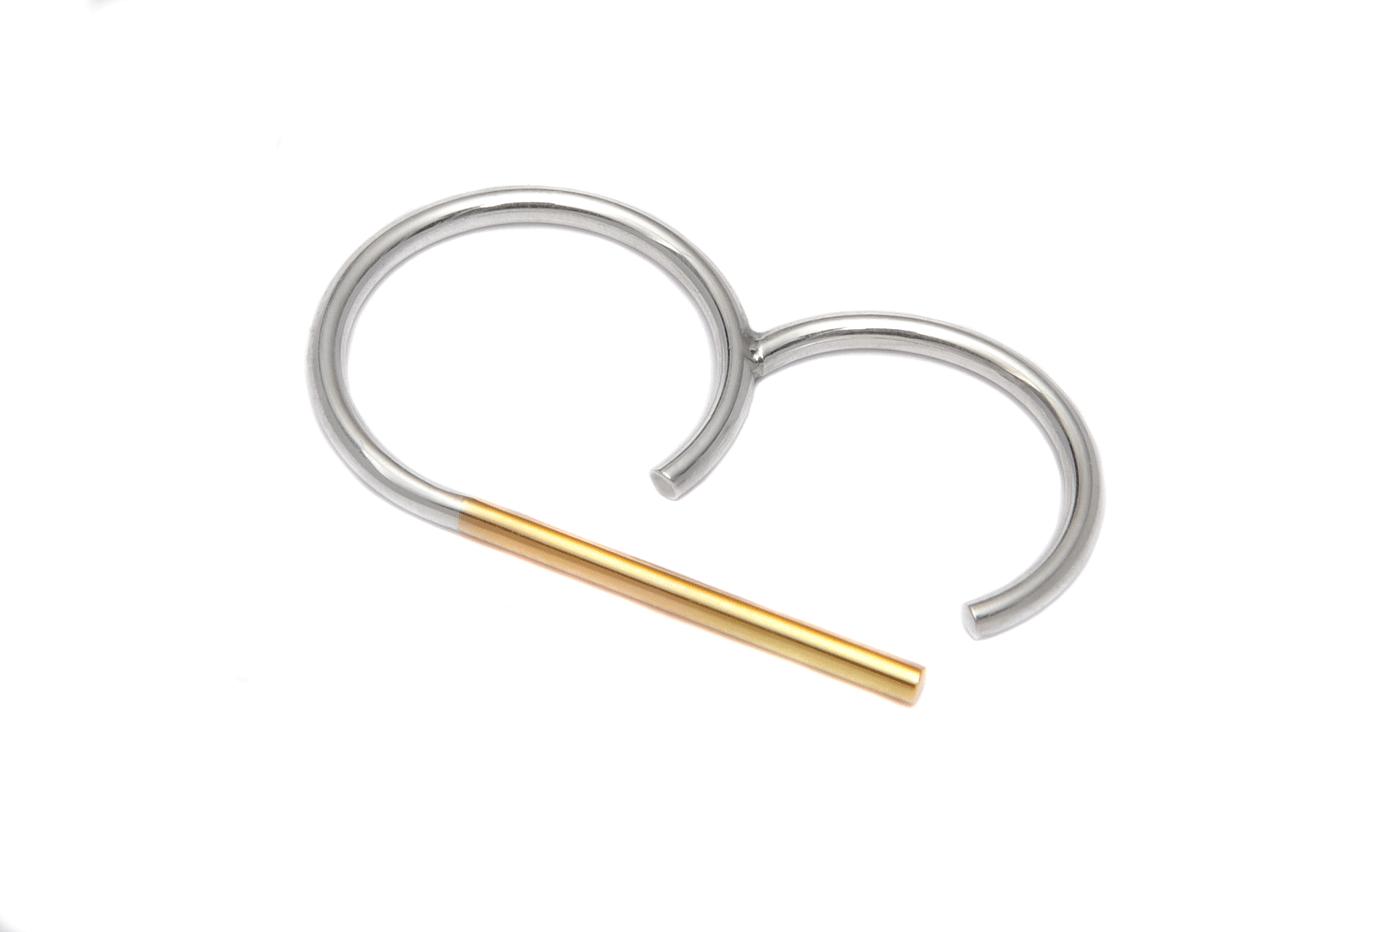 Adeline Cacheux Jewelry Design Bague Double Doigt Argent Or